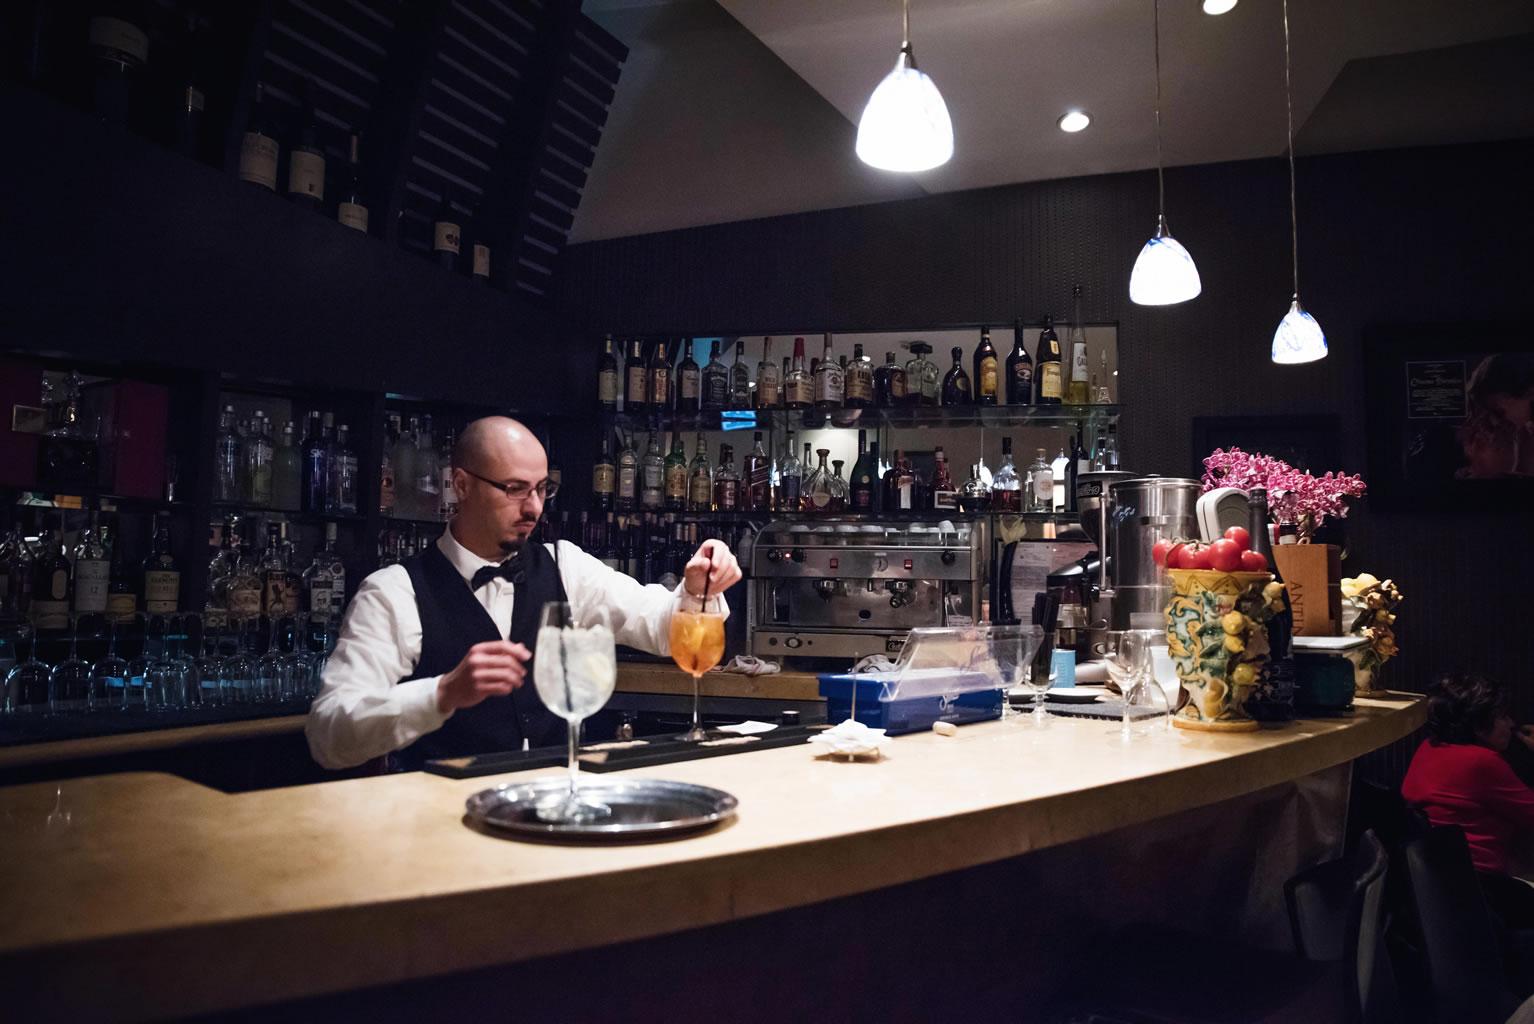 Piccolo Paradiso - Bartender & Cocktails-319987704